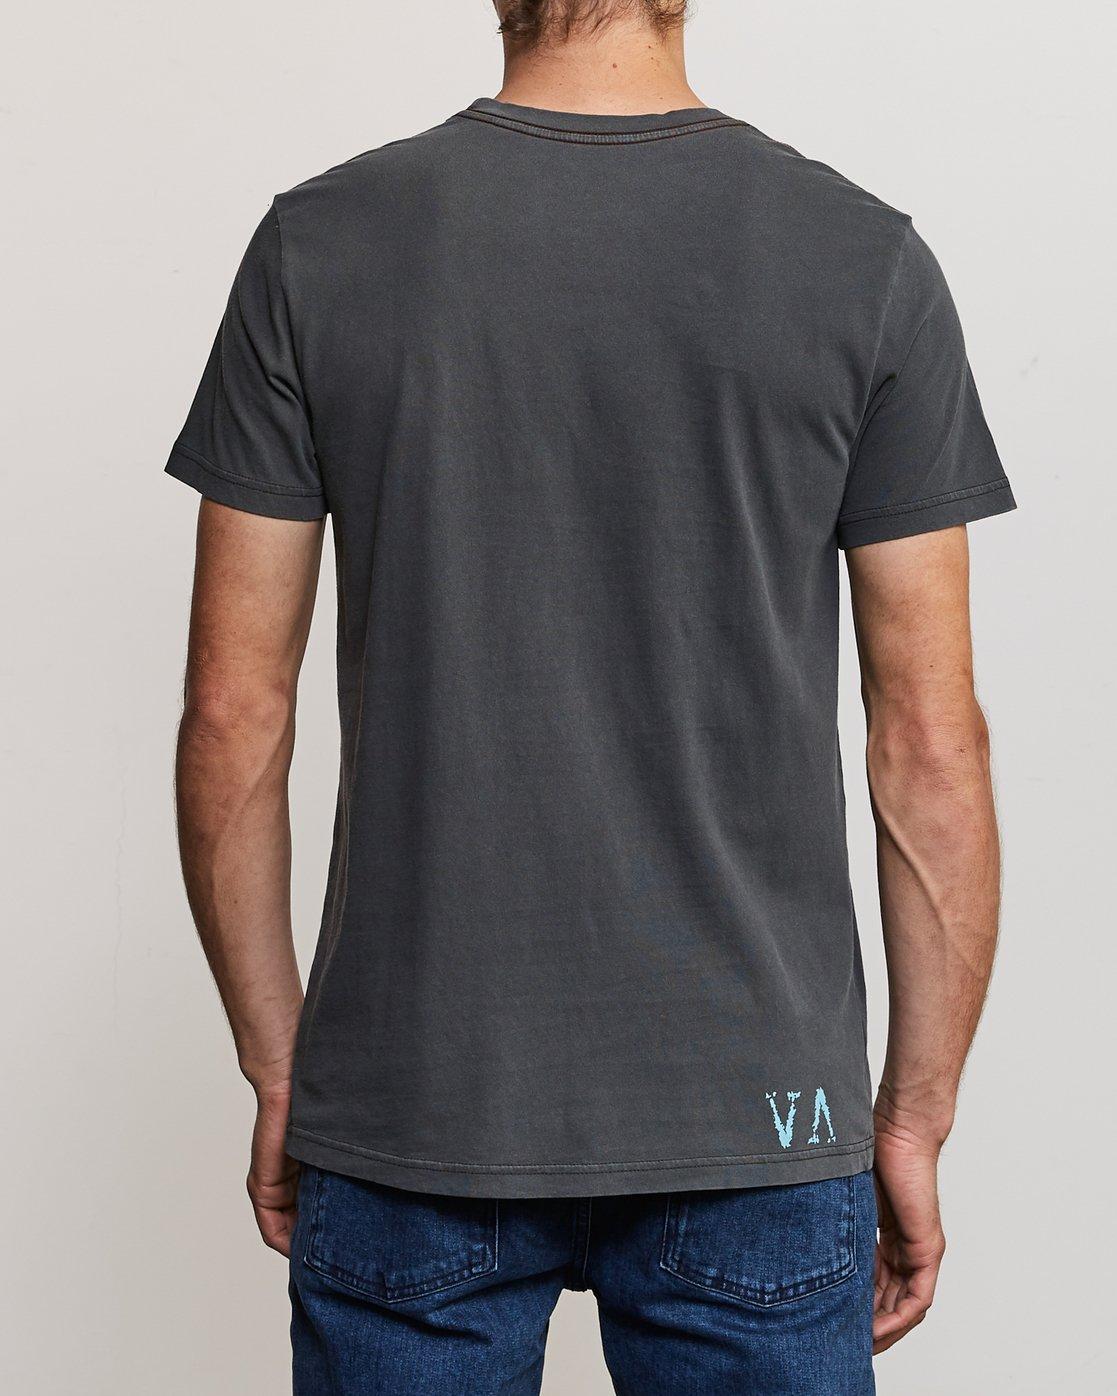 4 Johanna Olk Frosty Gaze T-Shirt Black M438URFR RVCA